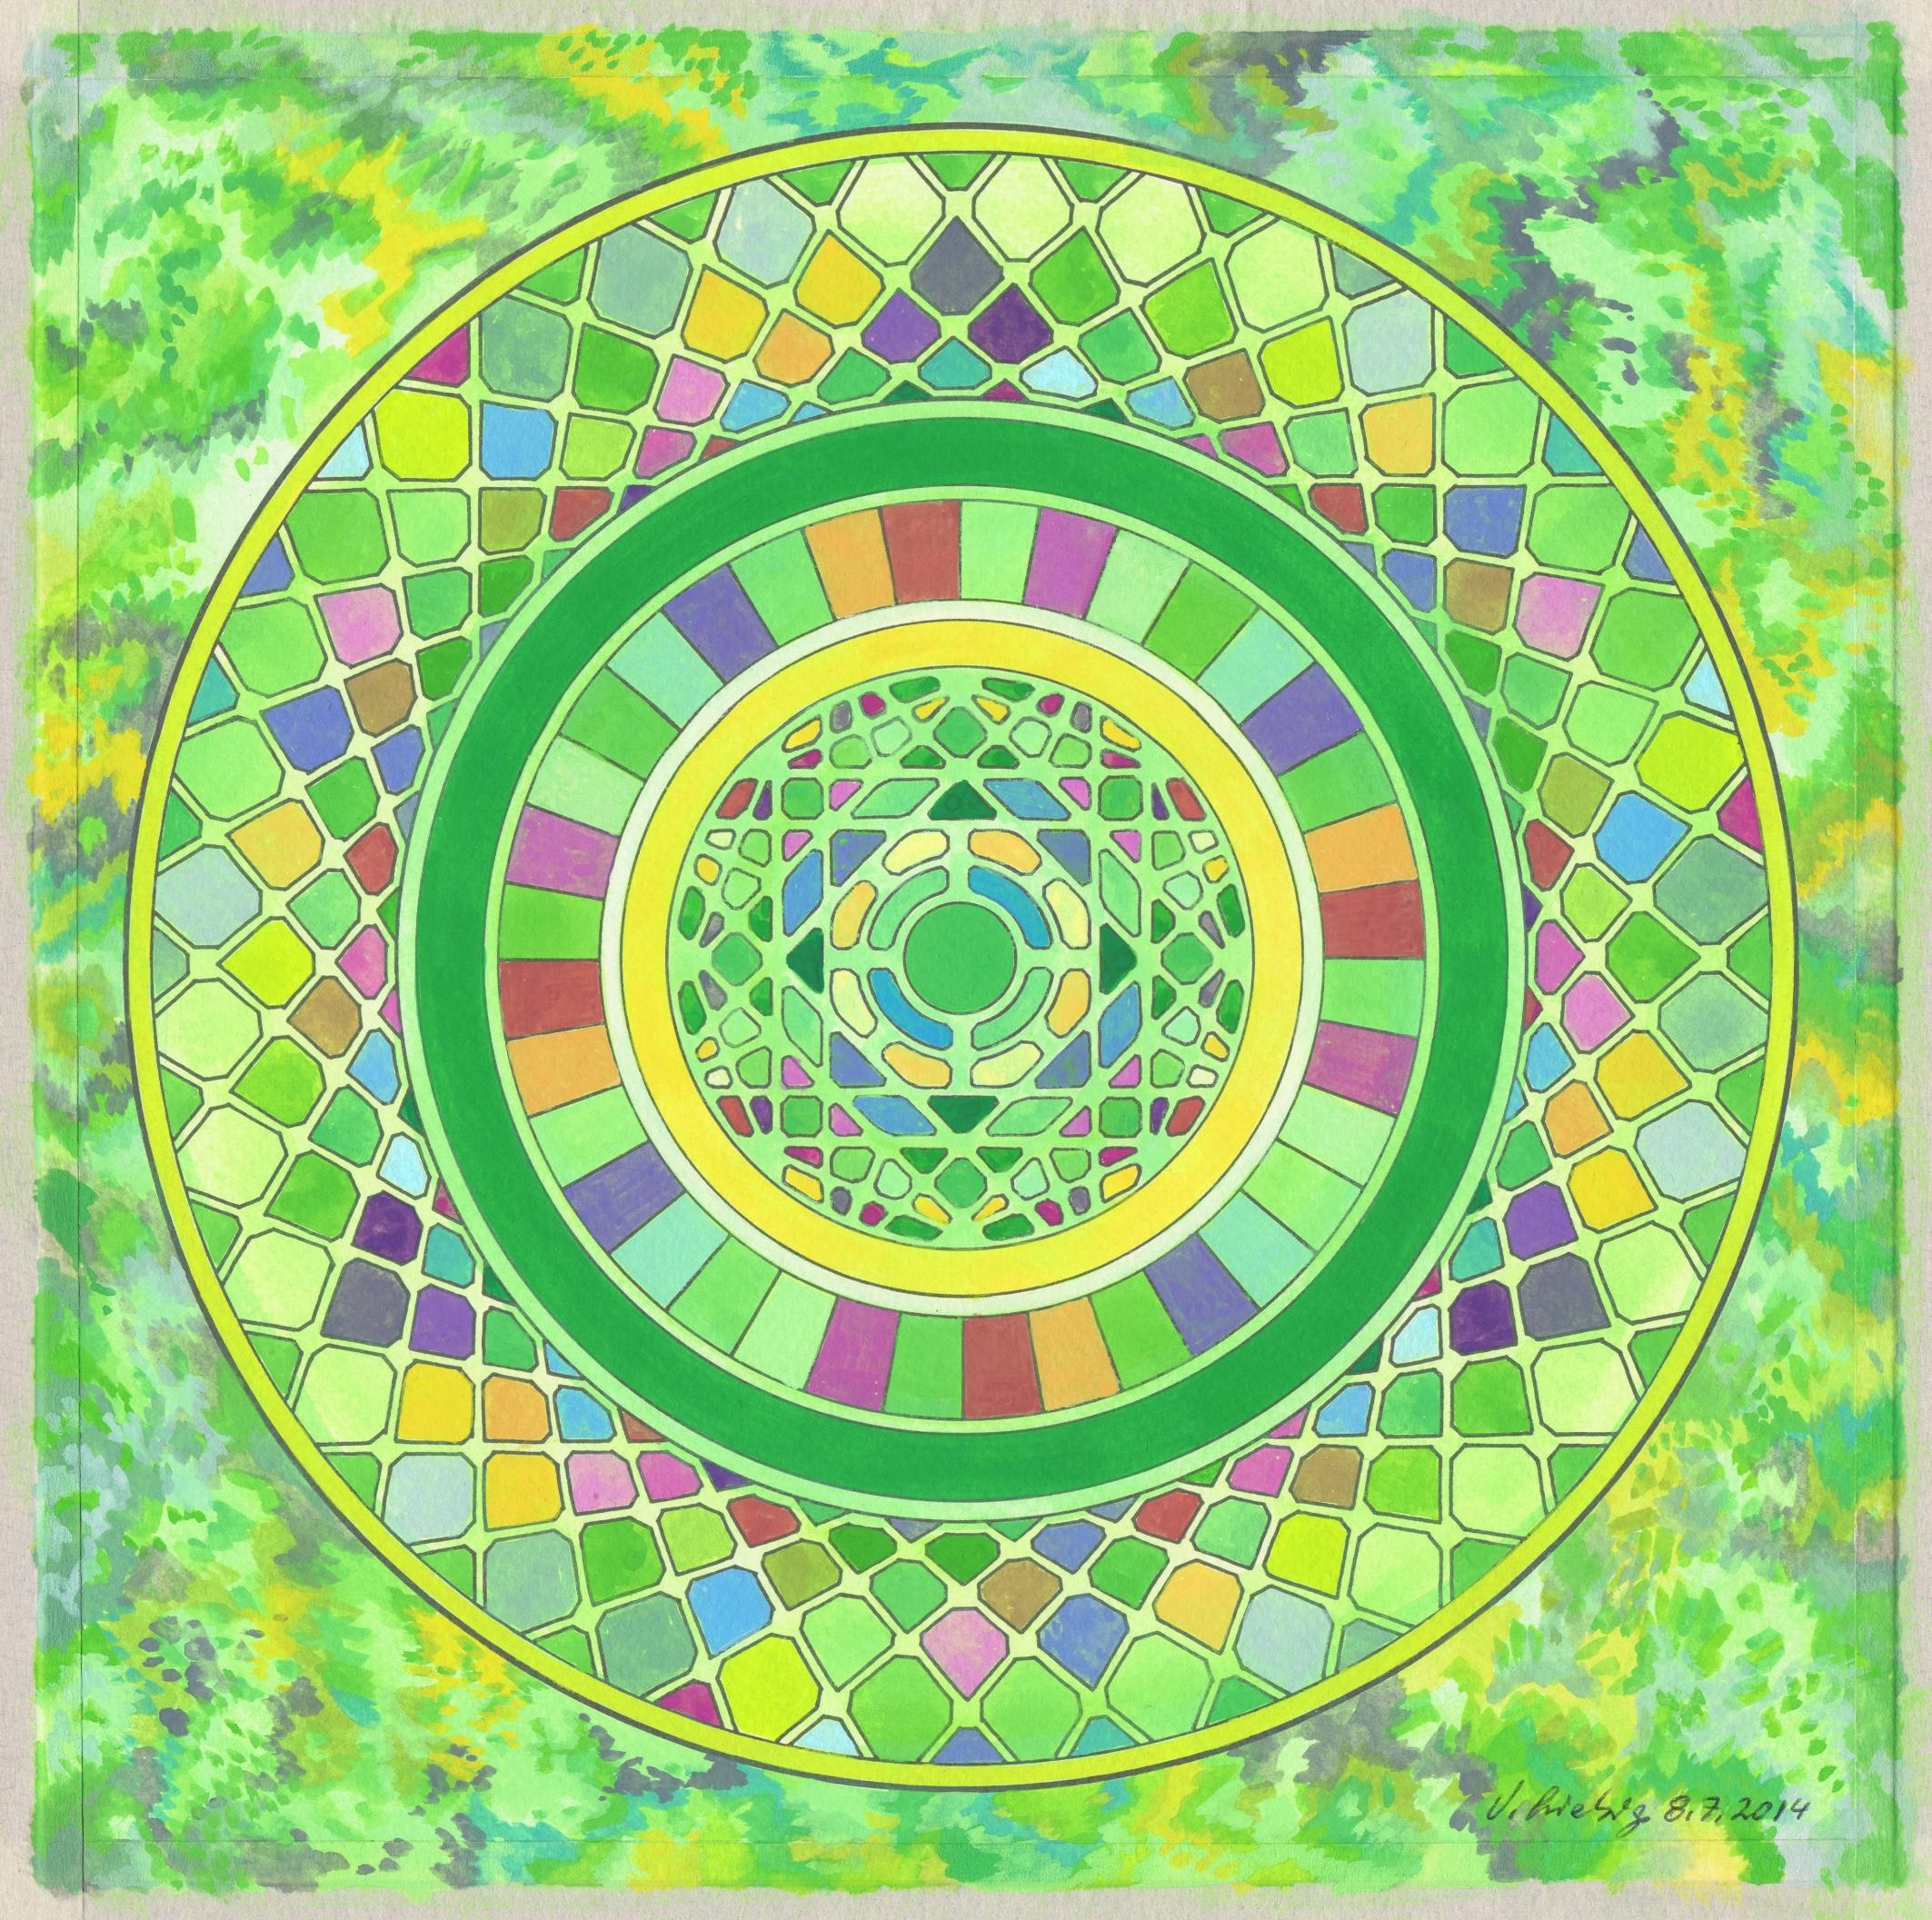 Mandala vom 8.7.2014